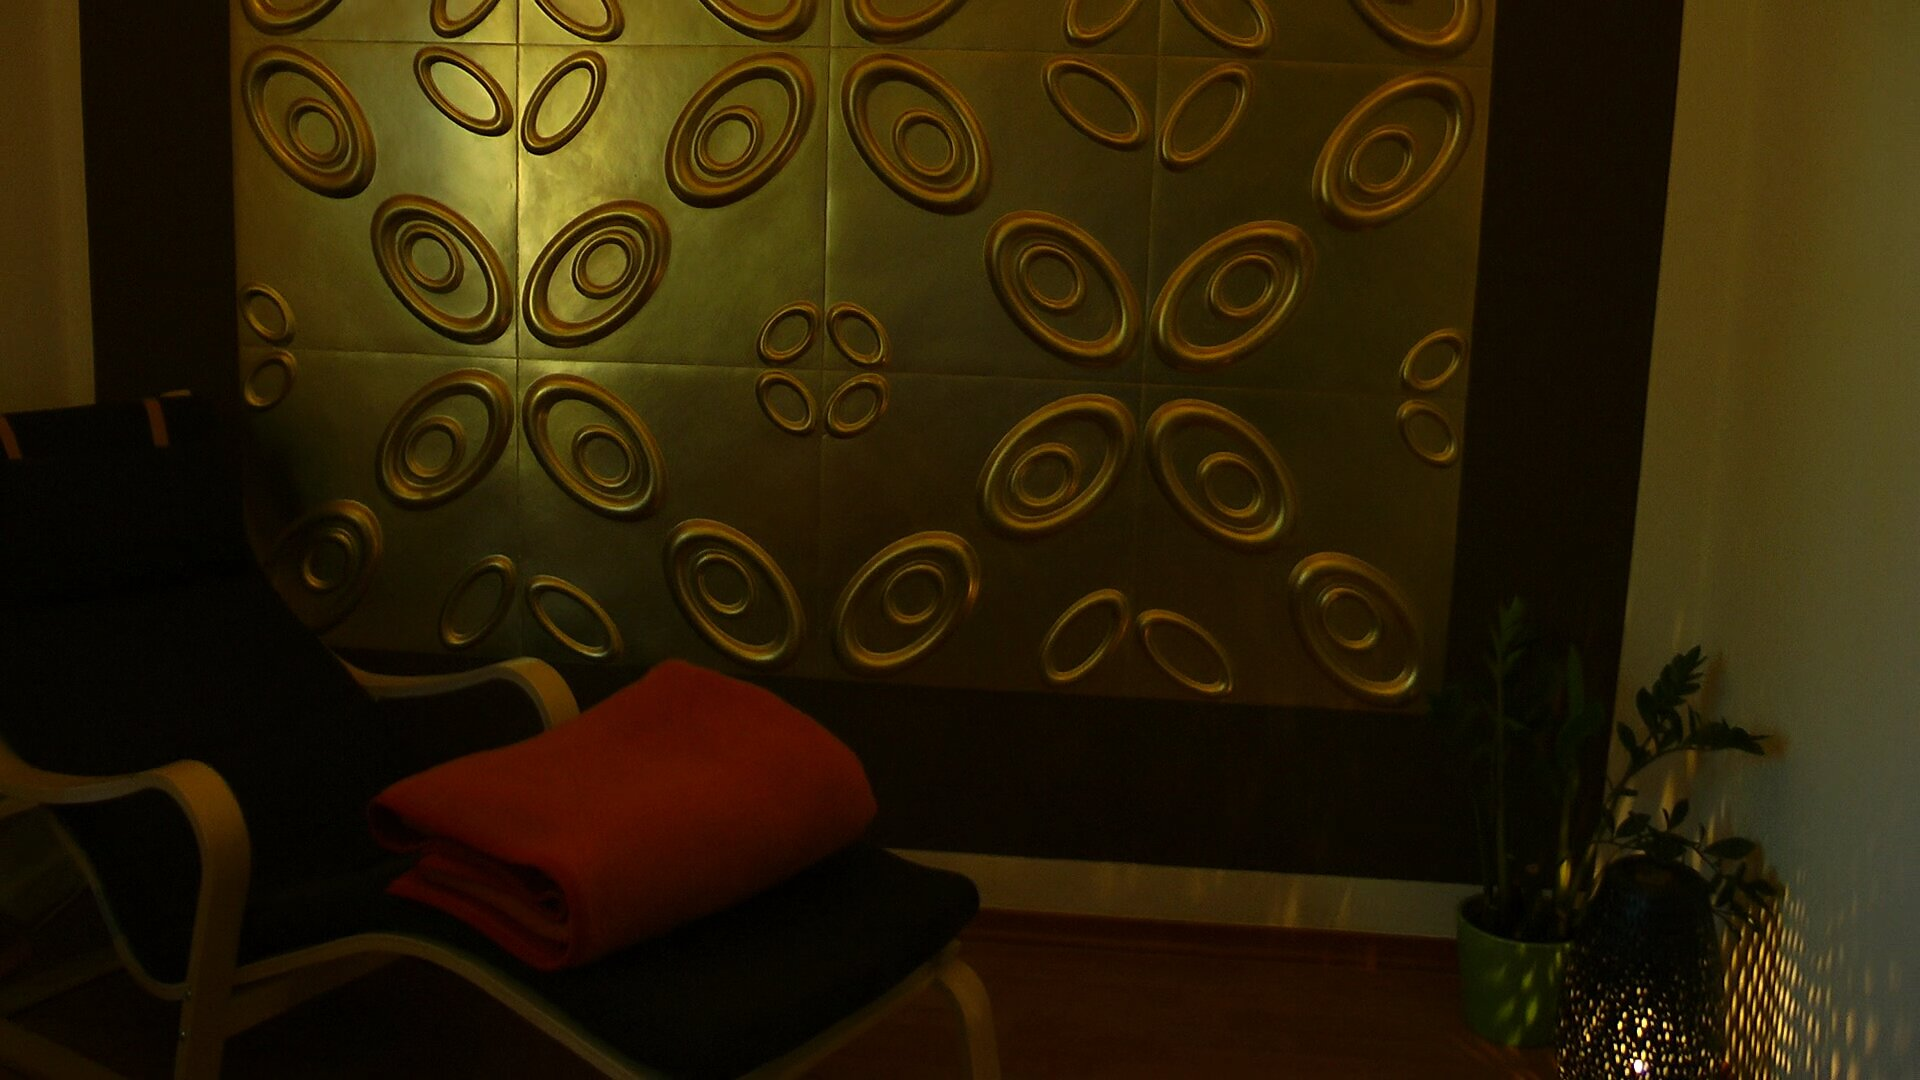 3D Wandpaneele - Referenzen - Vital Resort - Deckenpaneele - 3D Tapeten - Wandverkleidung